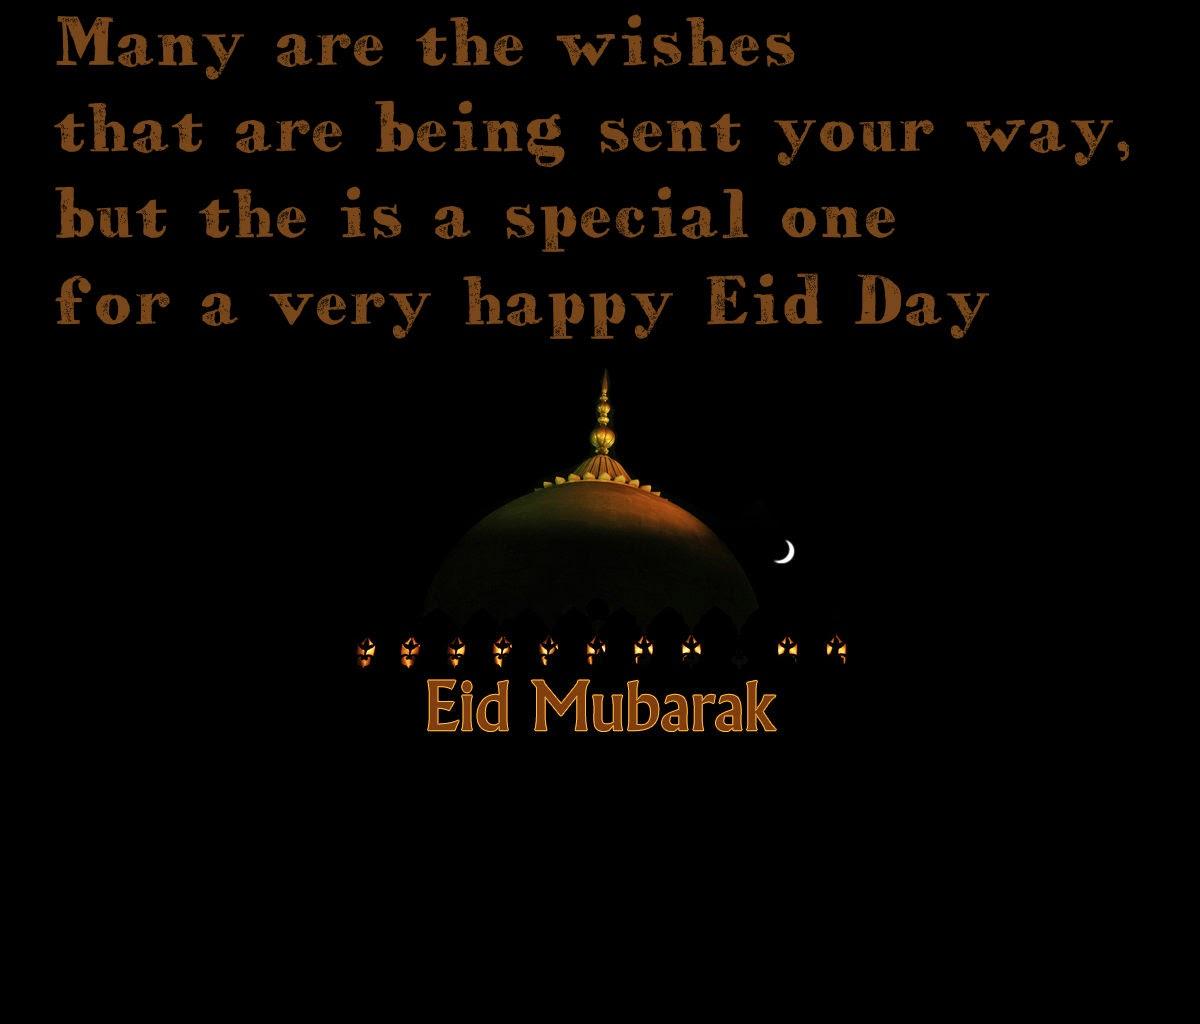 Happy Eid Wishes Quotes: Happy Eid Quotes. QuotesGram